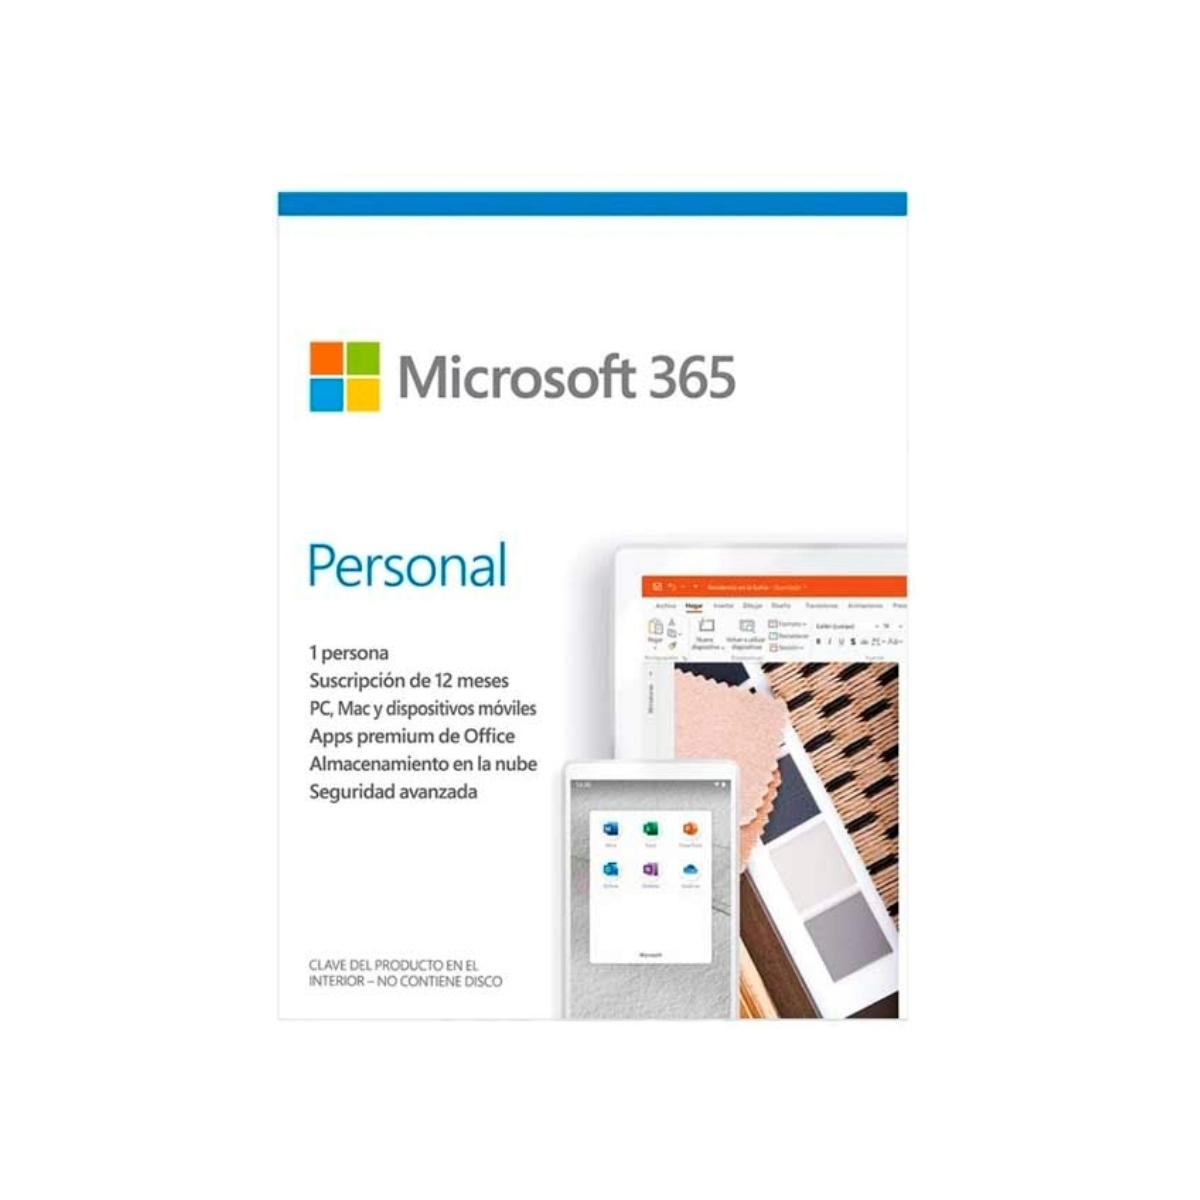 Microsoft-365-personal-6056-1-1.jpg